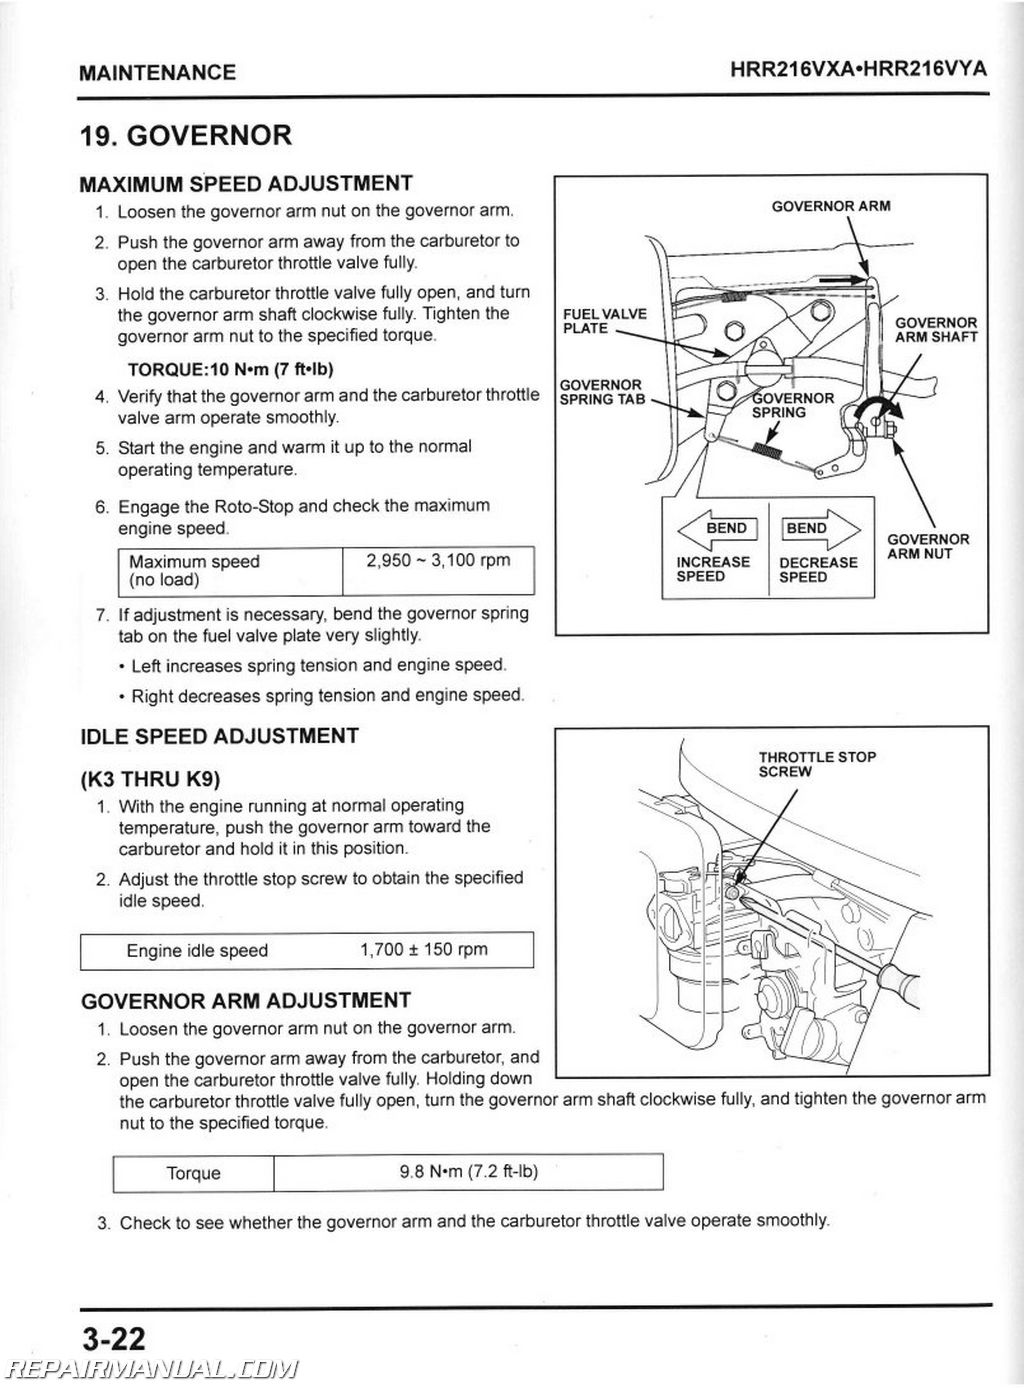 Honda 216 Manual Auto Electrical Wiring Diagram Lawn Mower Usa Lawnmower Carburetor Hxa Hxc And Hrr216vxa Hrr216vya Service 61vg3600vyae3